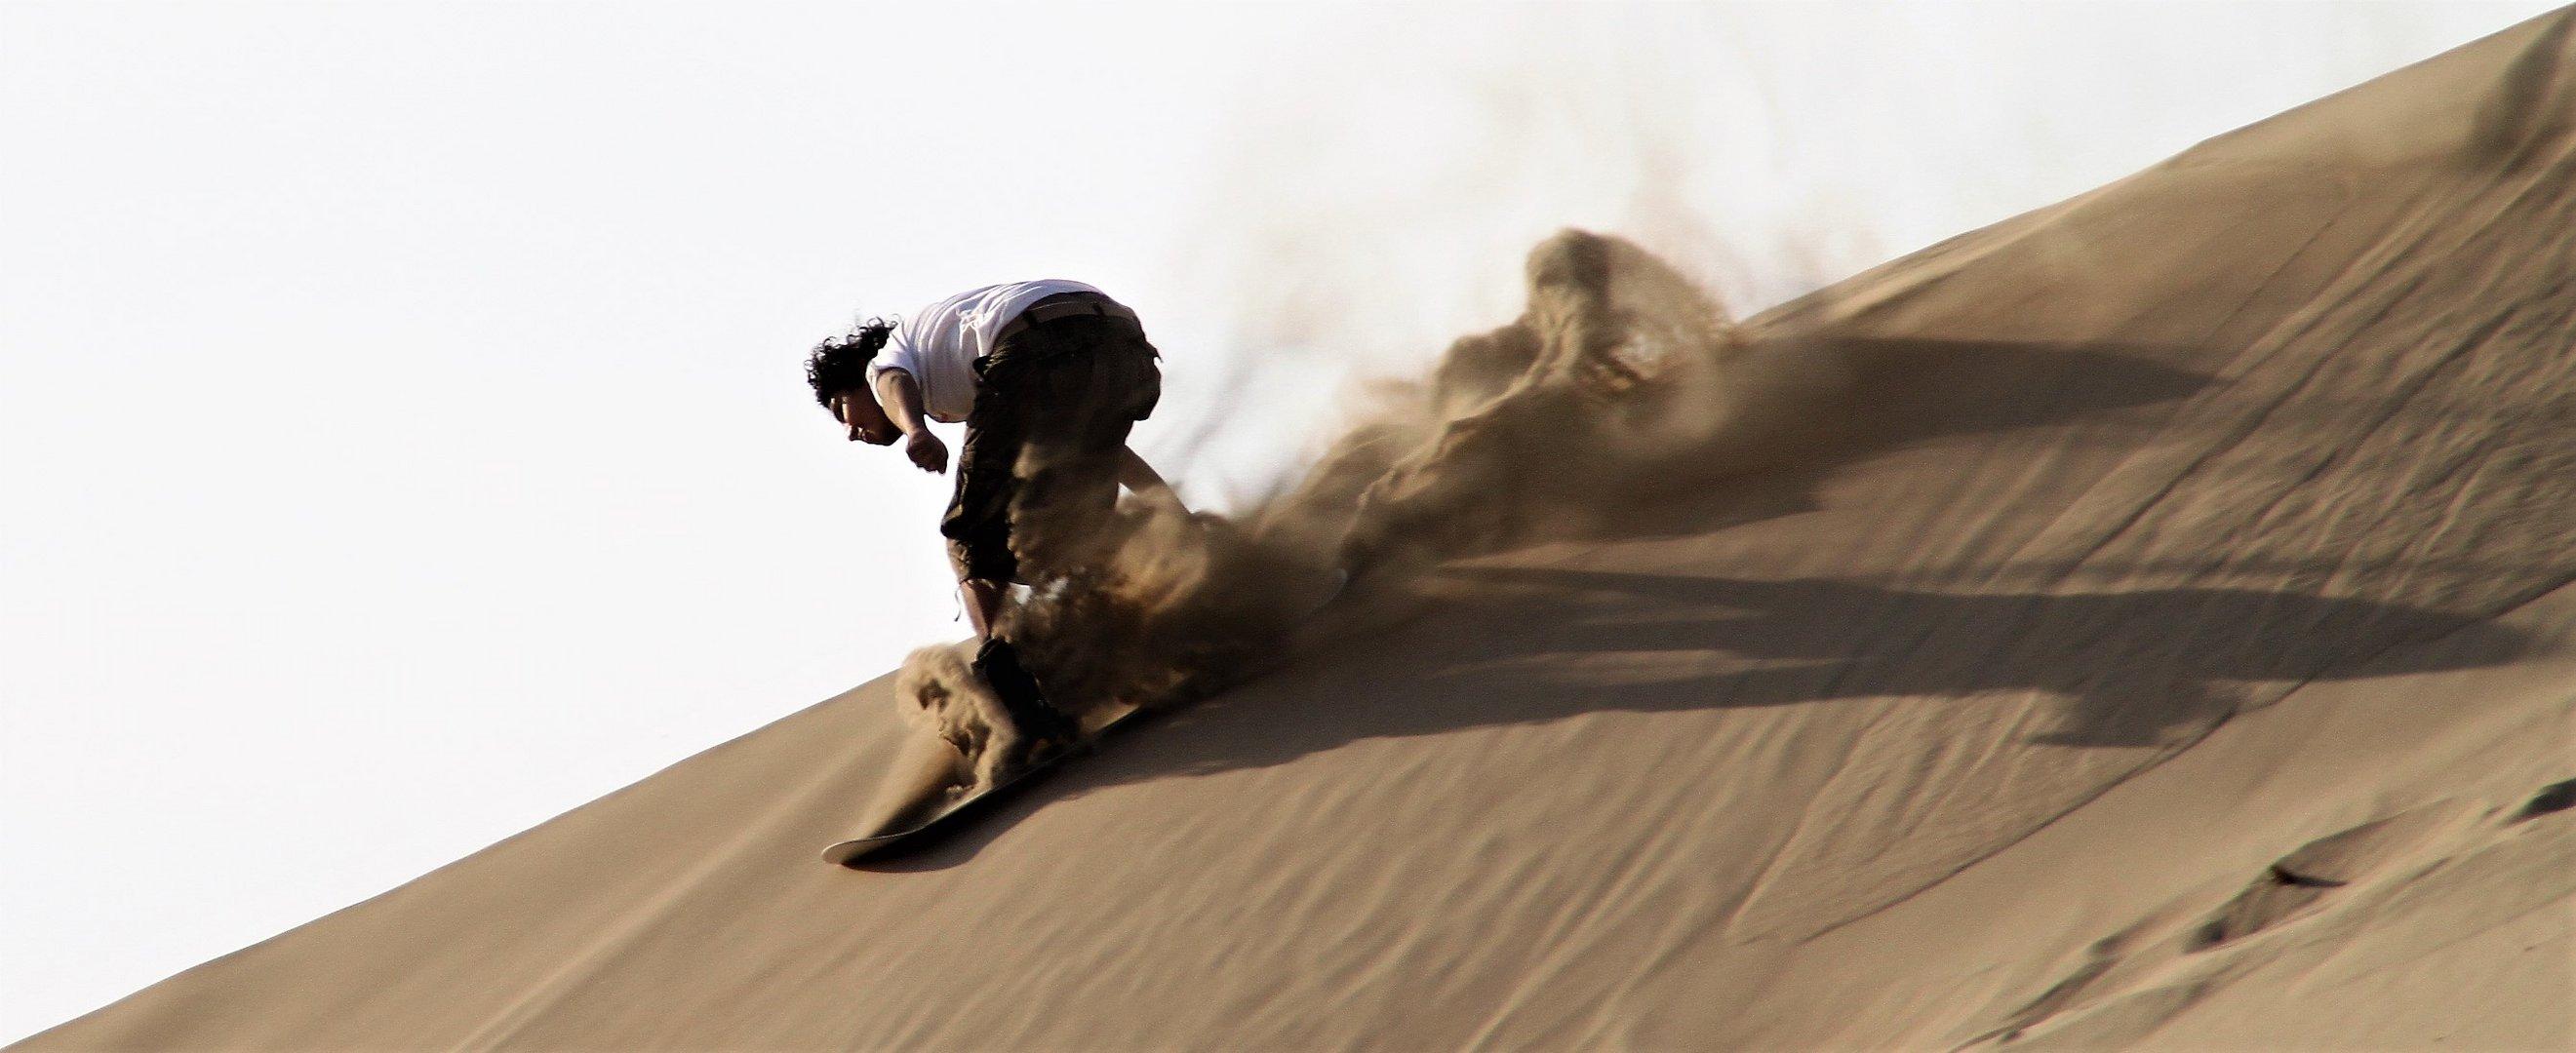 Skater Düne V2 Peru ca-21-93-col +3+4Perufotos +NEWS